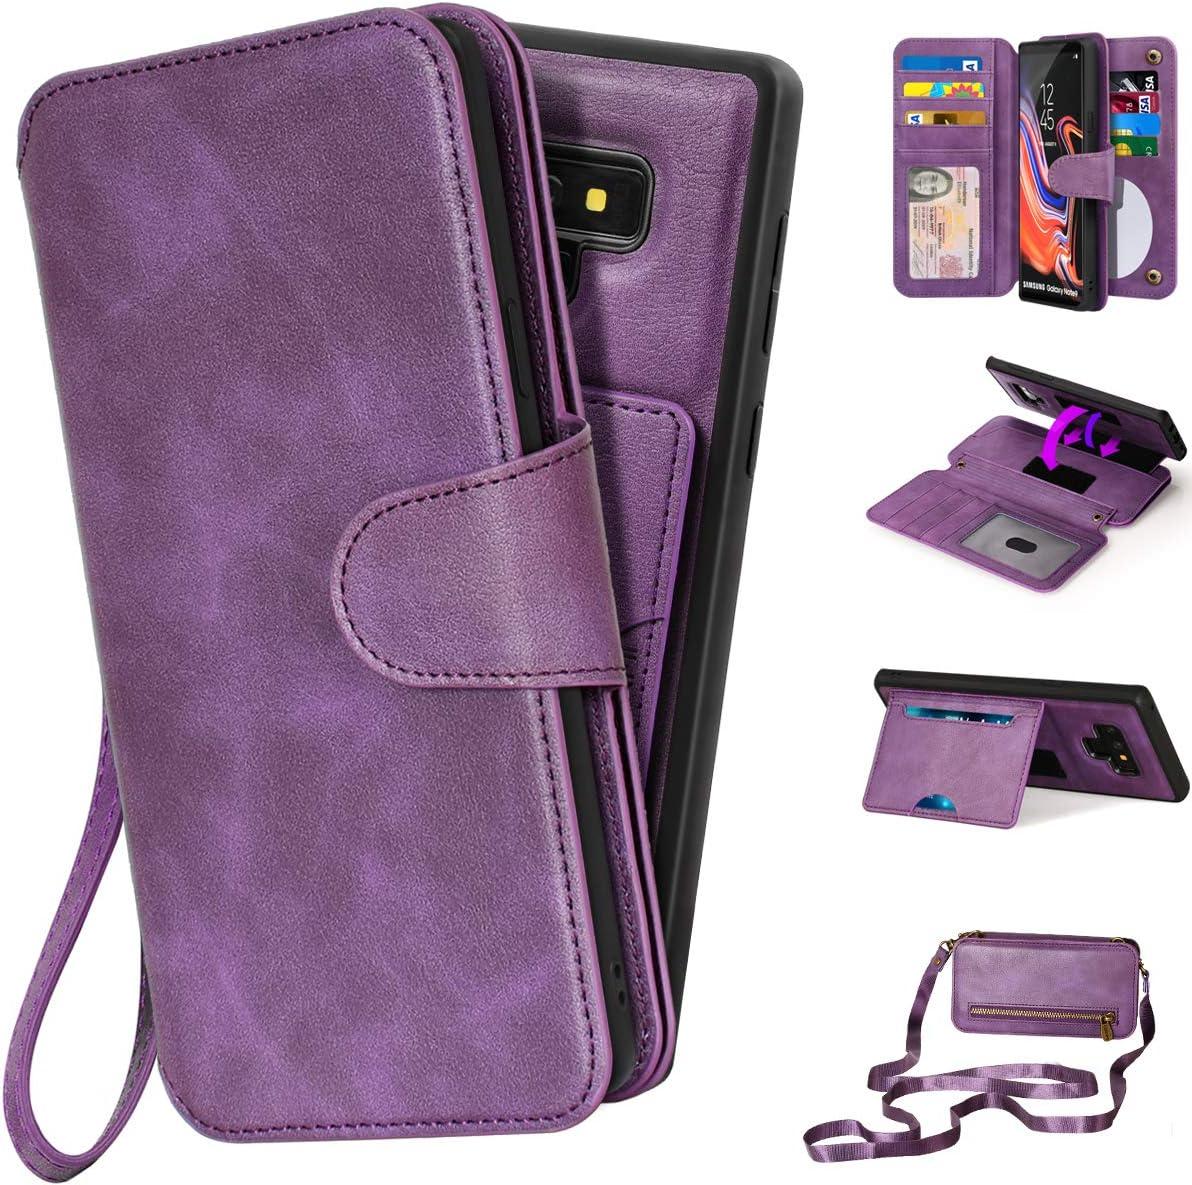 CORNMI Note 9 Wallet Case, Mirror 13 Card Holders Crossbody Wrist Strap Kickstand Detachable Purse Leather Folio Zipper Pocket Flip Protective Cover for Samsung Galaxy N9 Purple